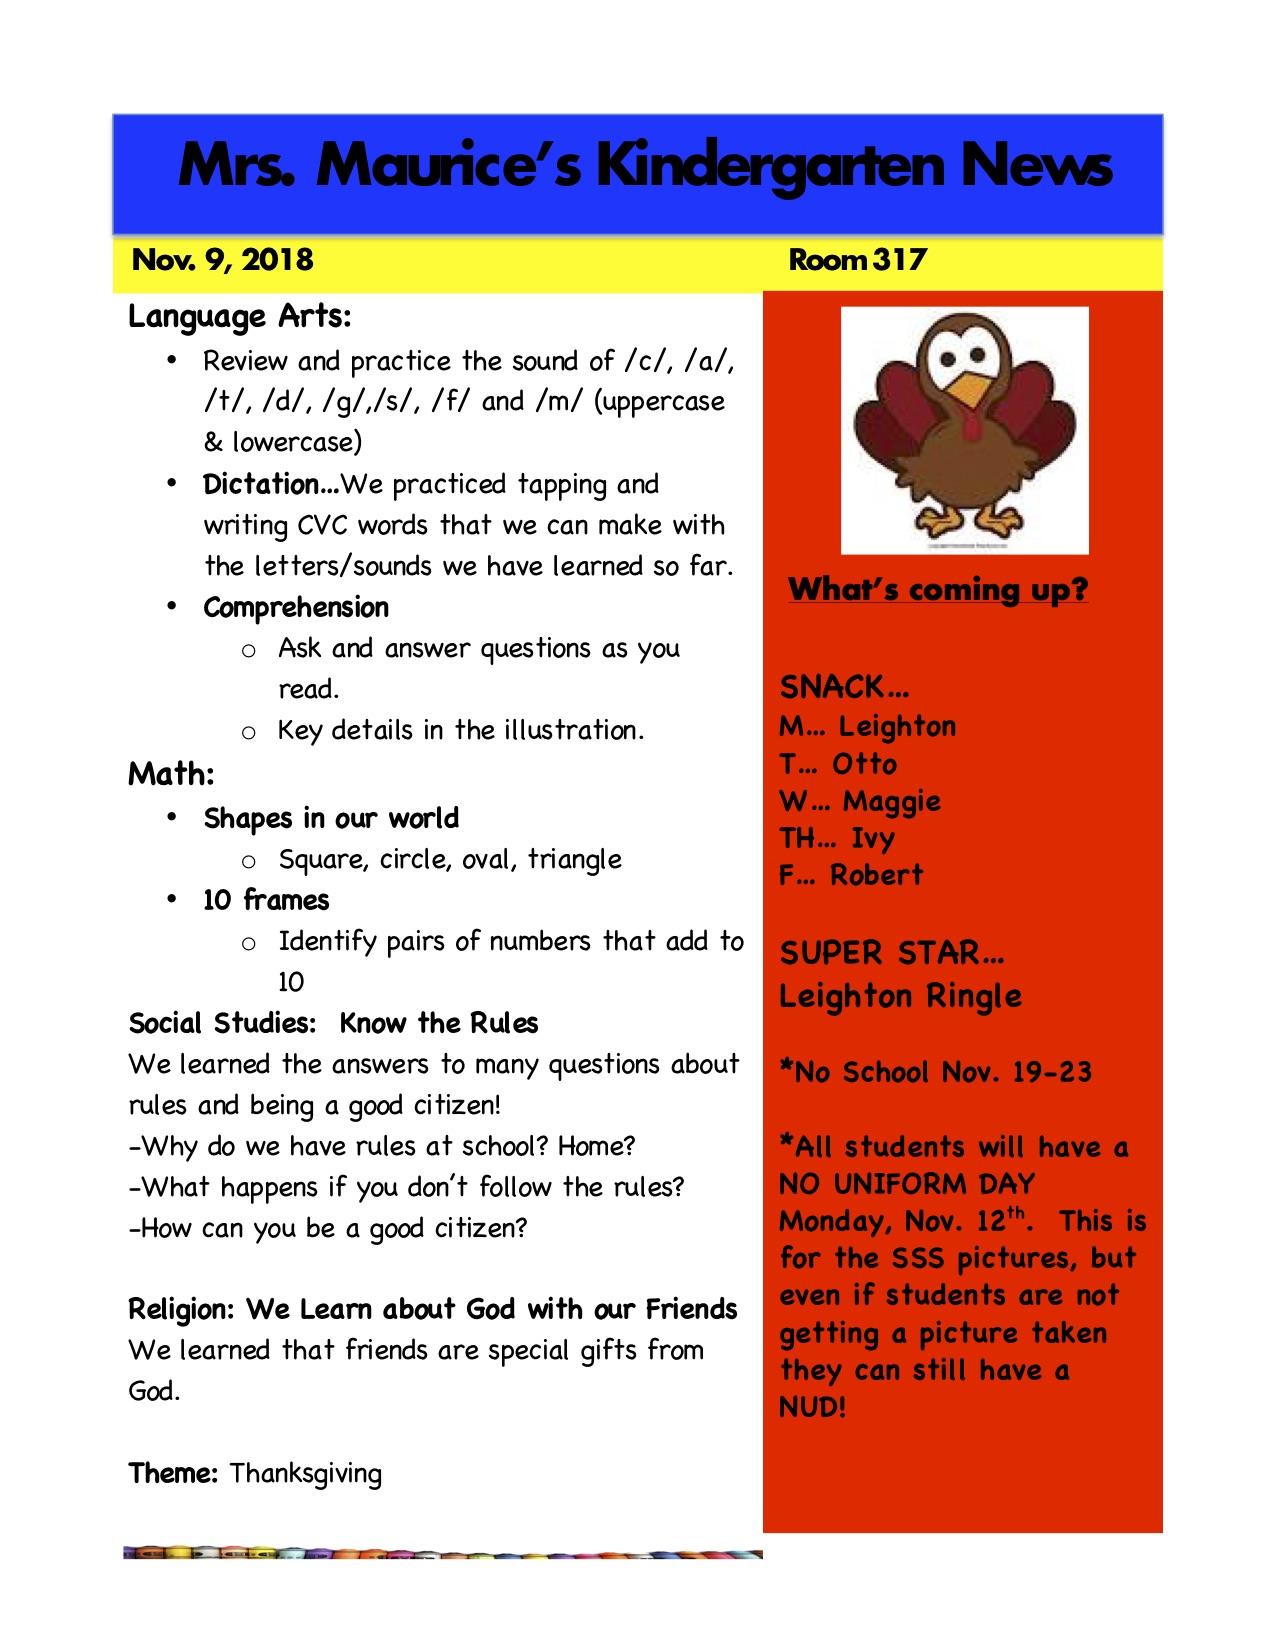 Kindergarten News Nov. 9.jpg